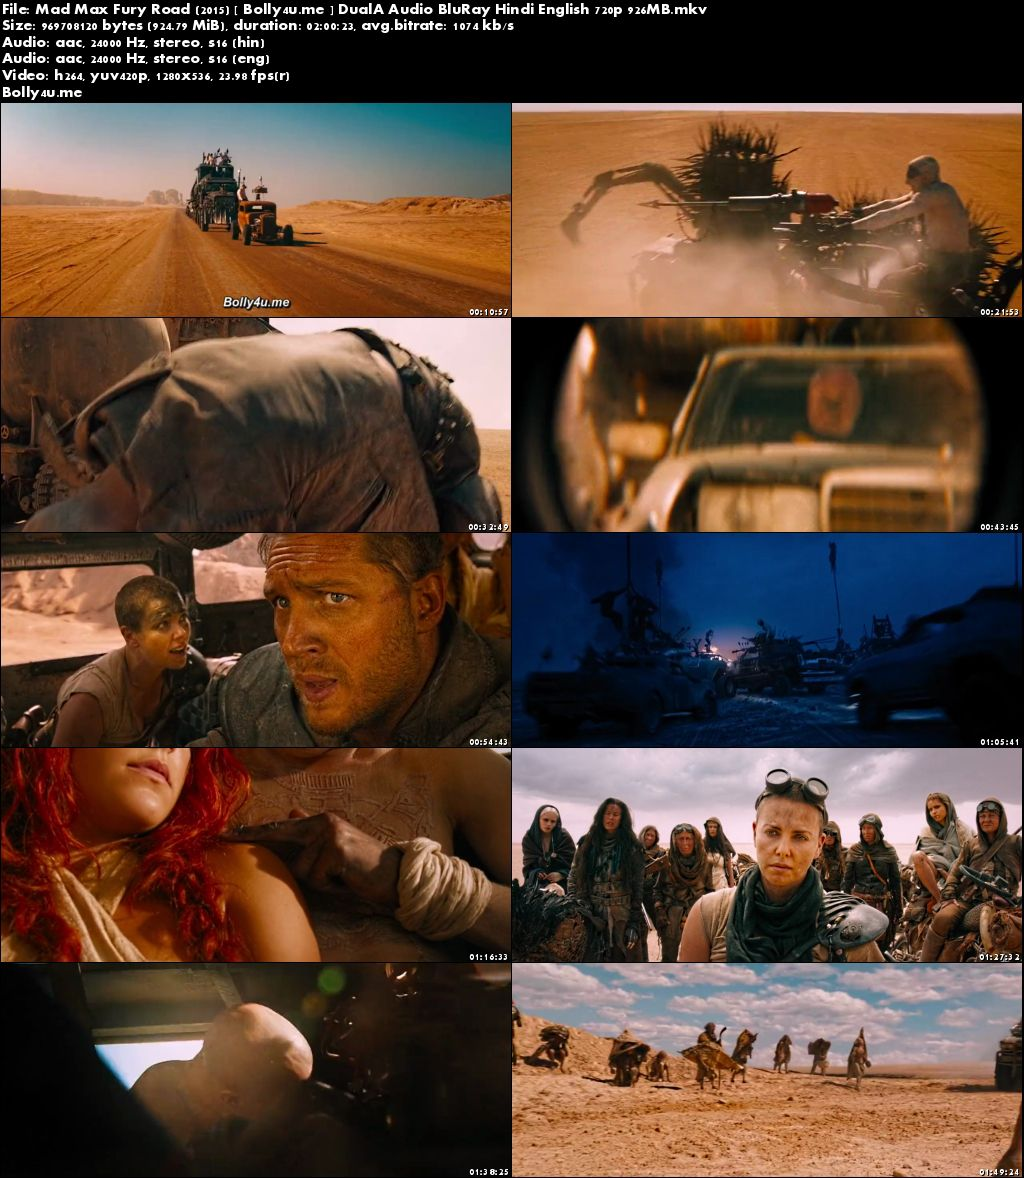 Mad Max Fury Road 2015 BRRip 350MB Hindi Dual Audio 480p Download